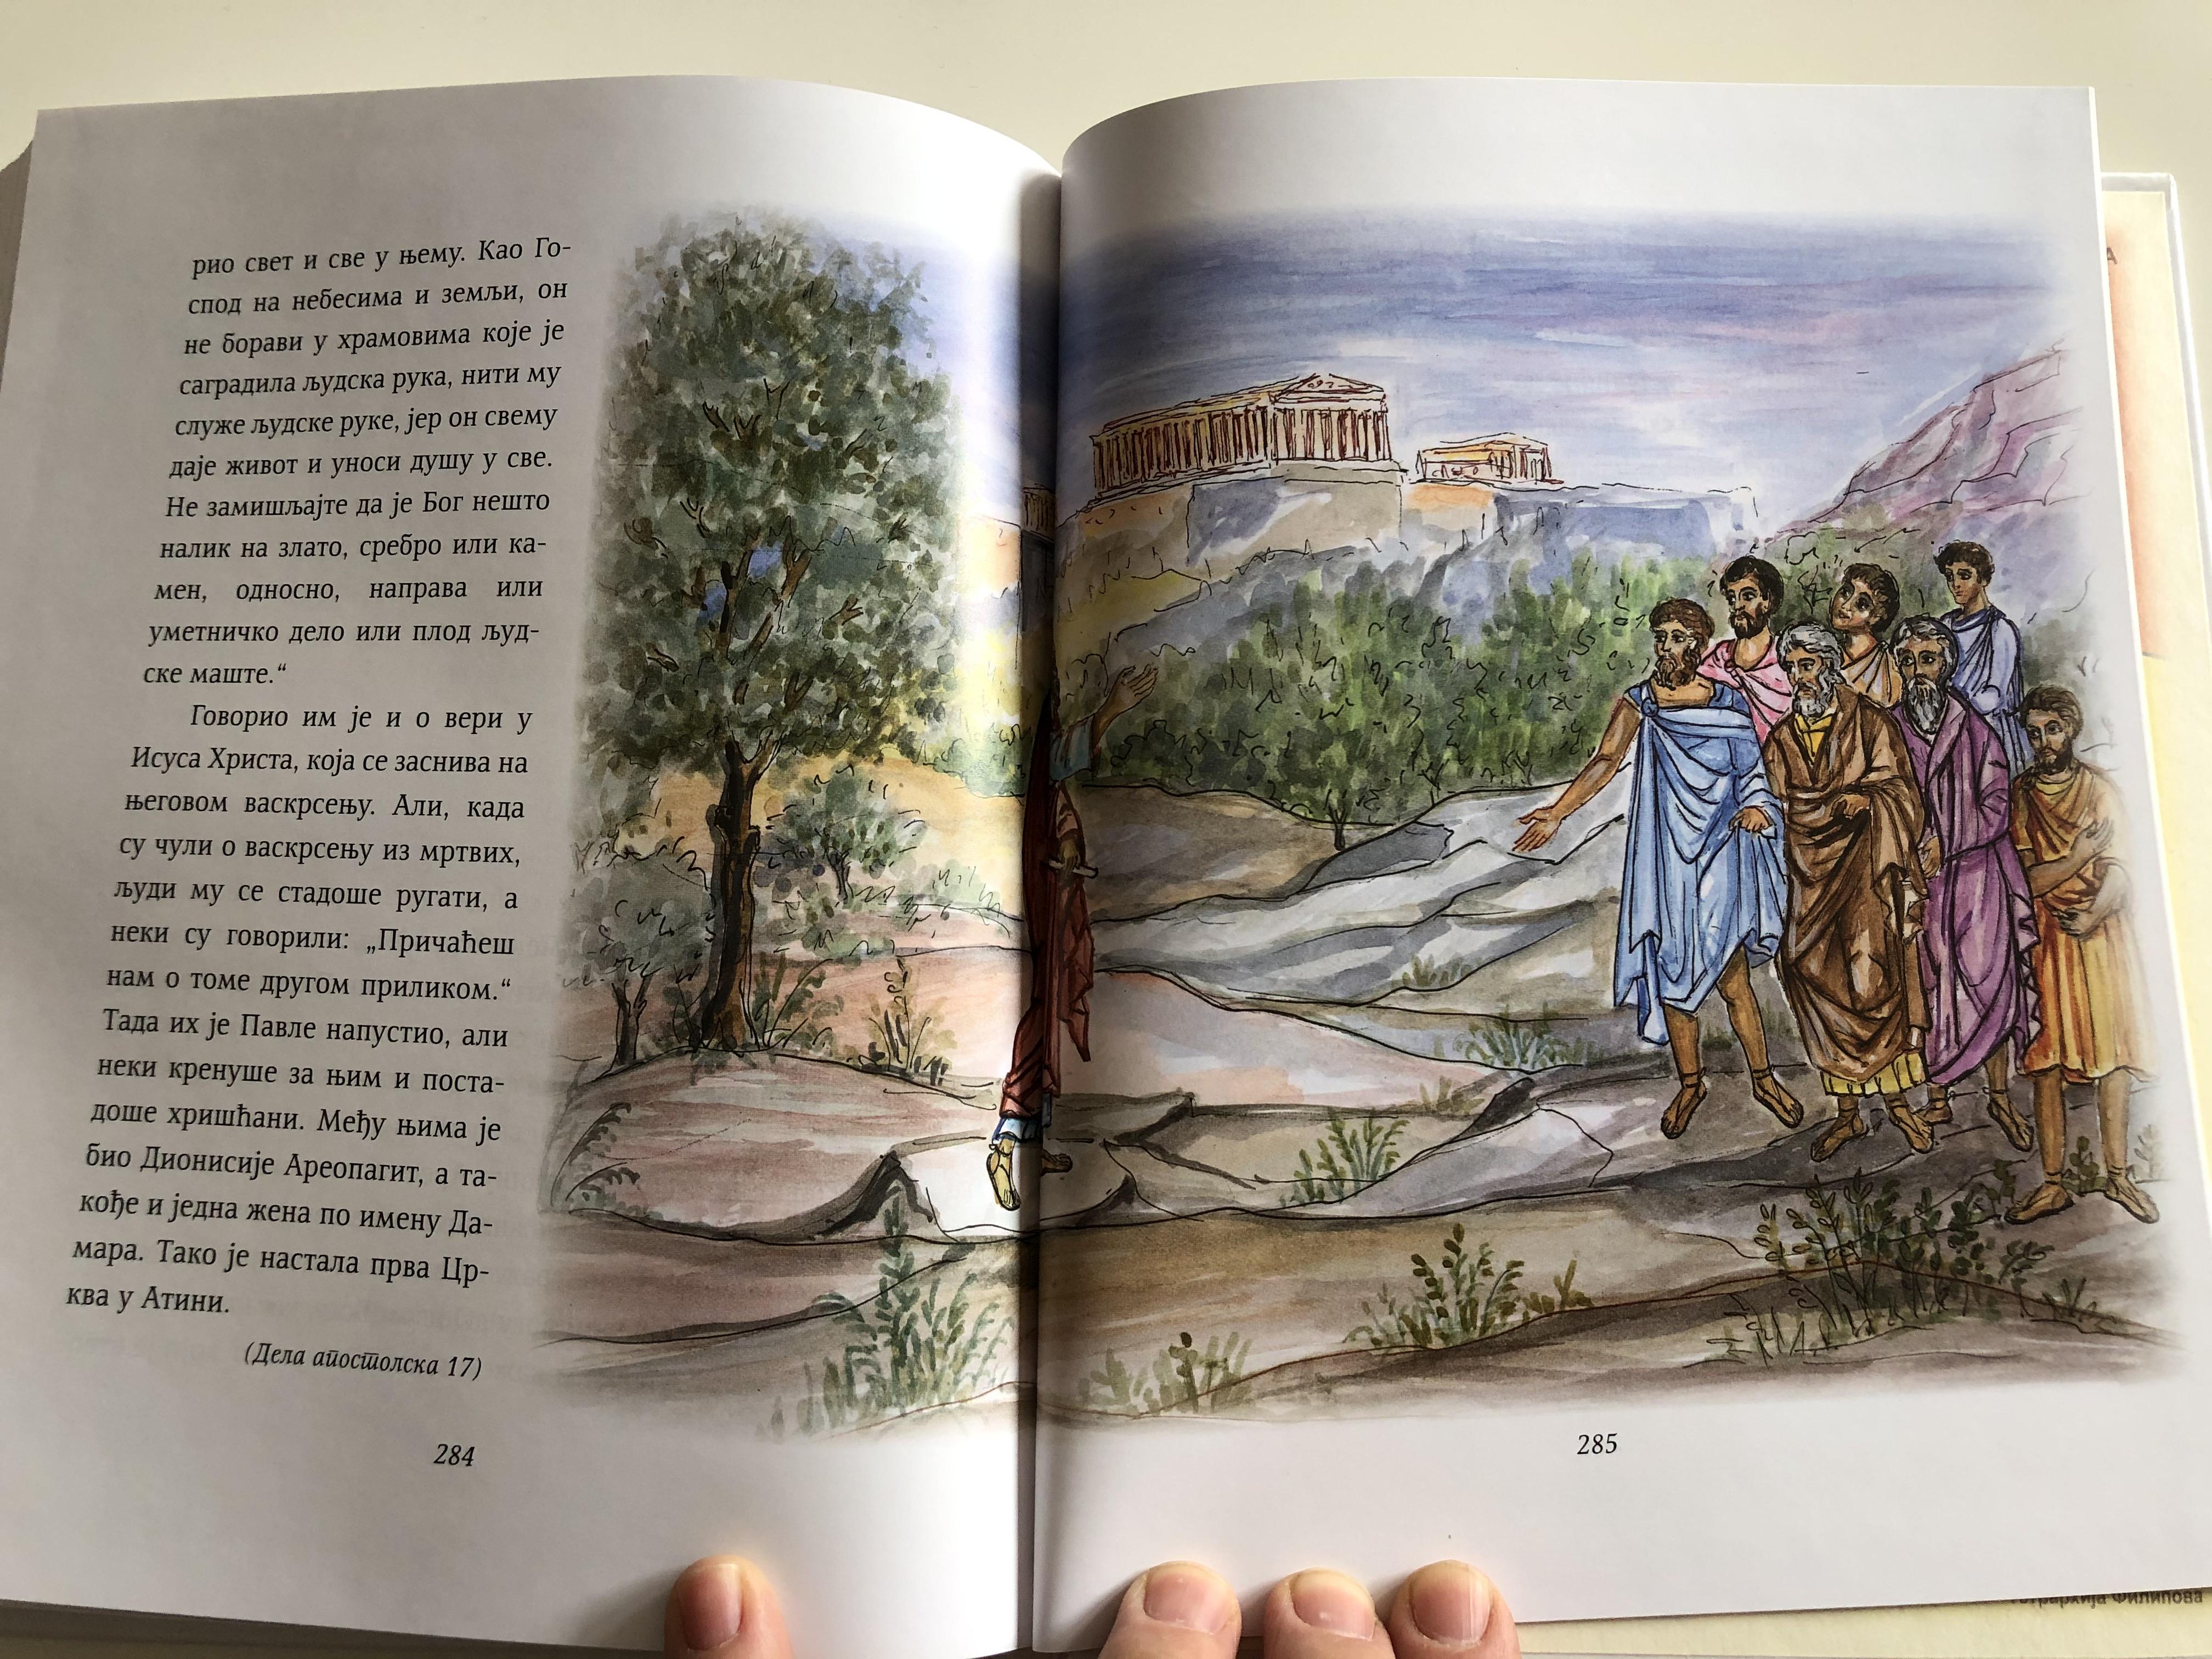 -by-marta-kapetanaku-ksinopulu-keti-hioteli-serbian-edition-of-children-s-bible-reader-13.jpg